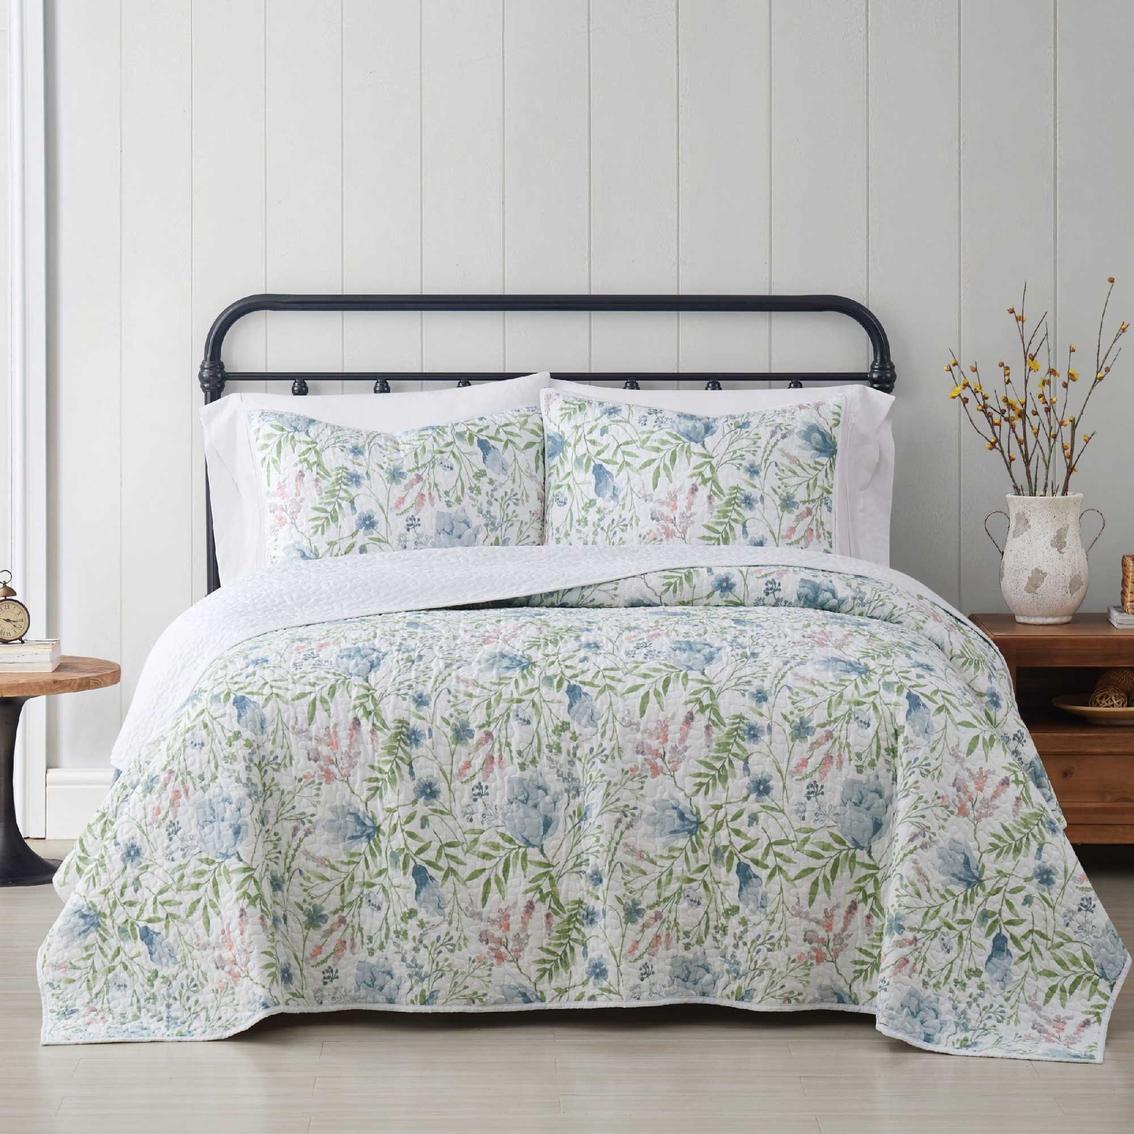 Cottage Classics Field Floral Quilt Set Bedding Sets Household Shop The Exchange